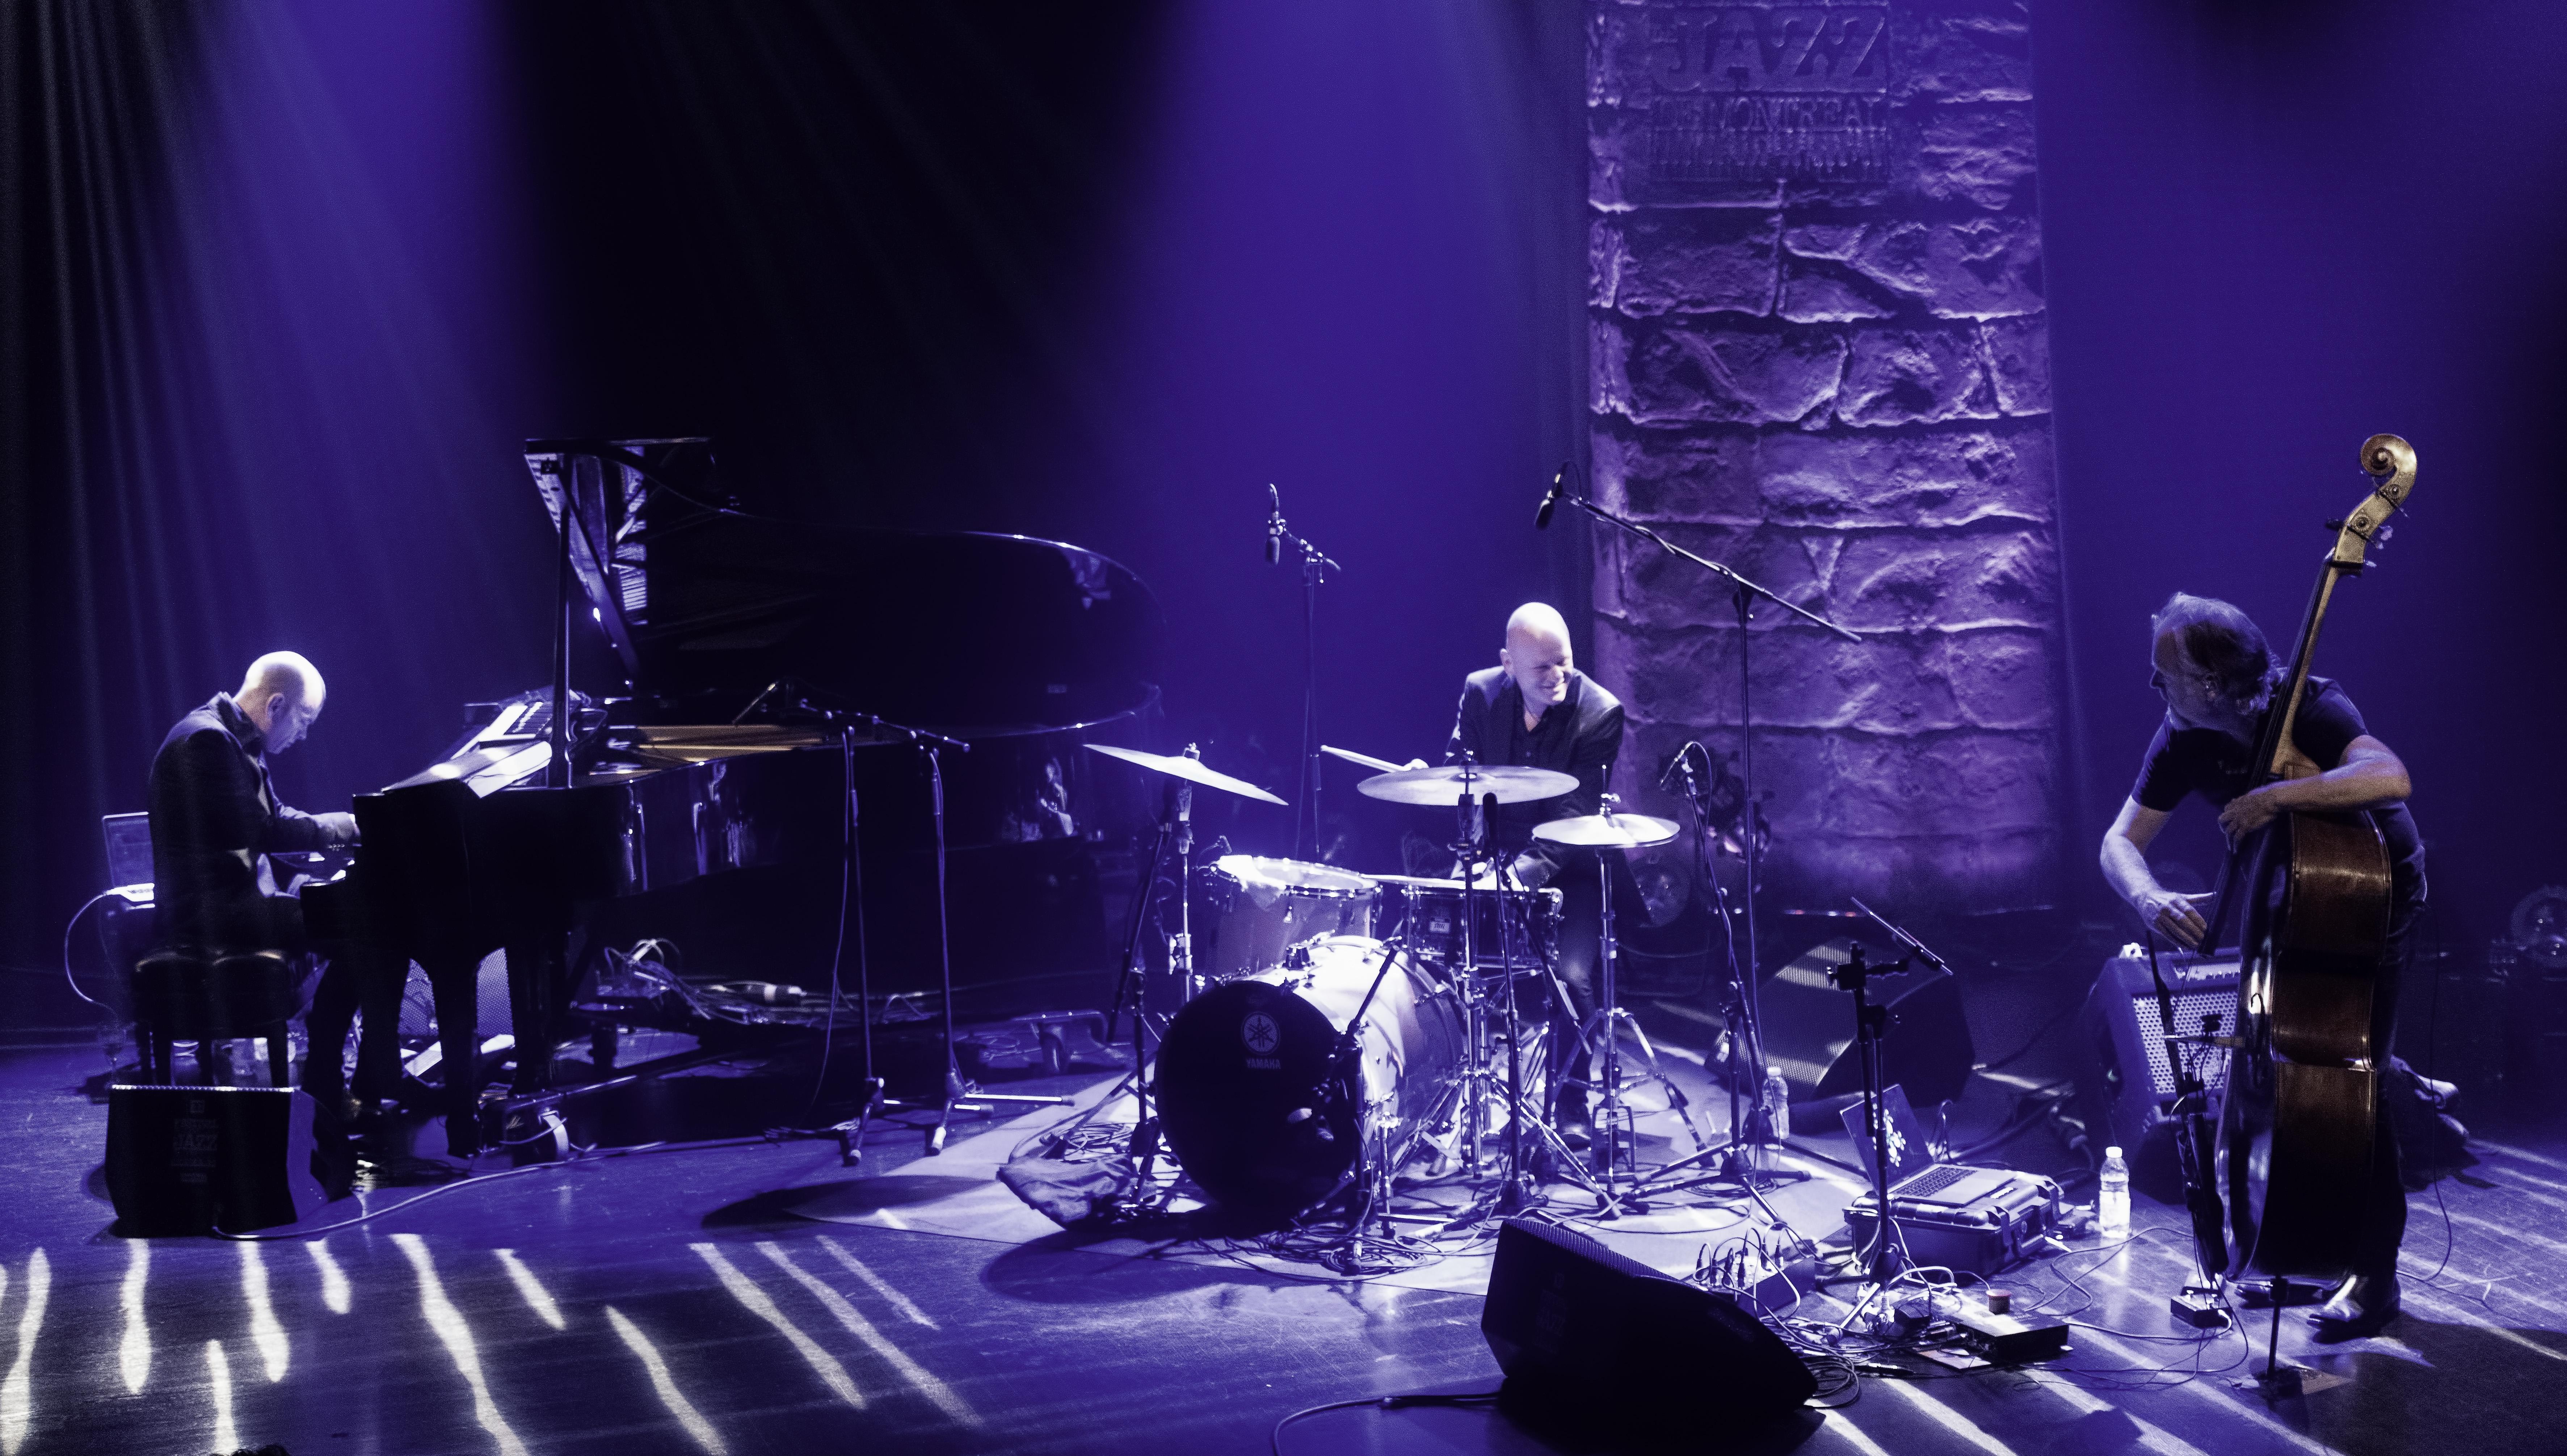 Tord Gustavsen, Jarle Vespestad and Gjermund Silset with the Tord Gustavsen Trio At The Montreal International Jazz Festival 2019